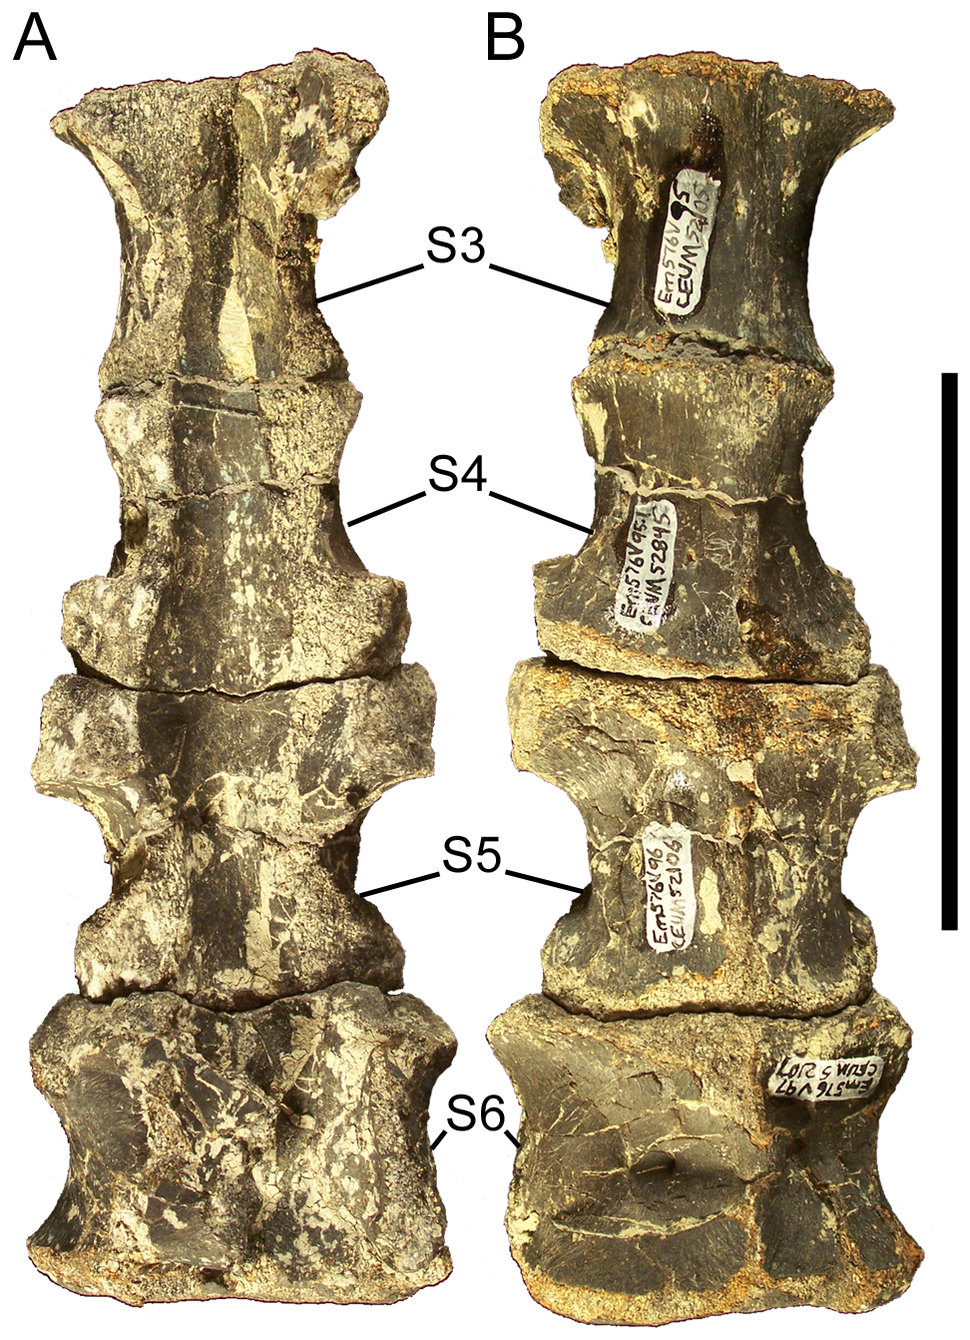 Eolambia sacrum